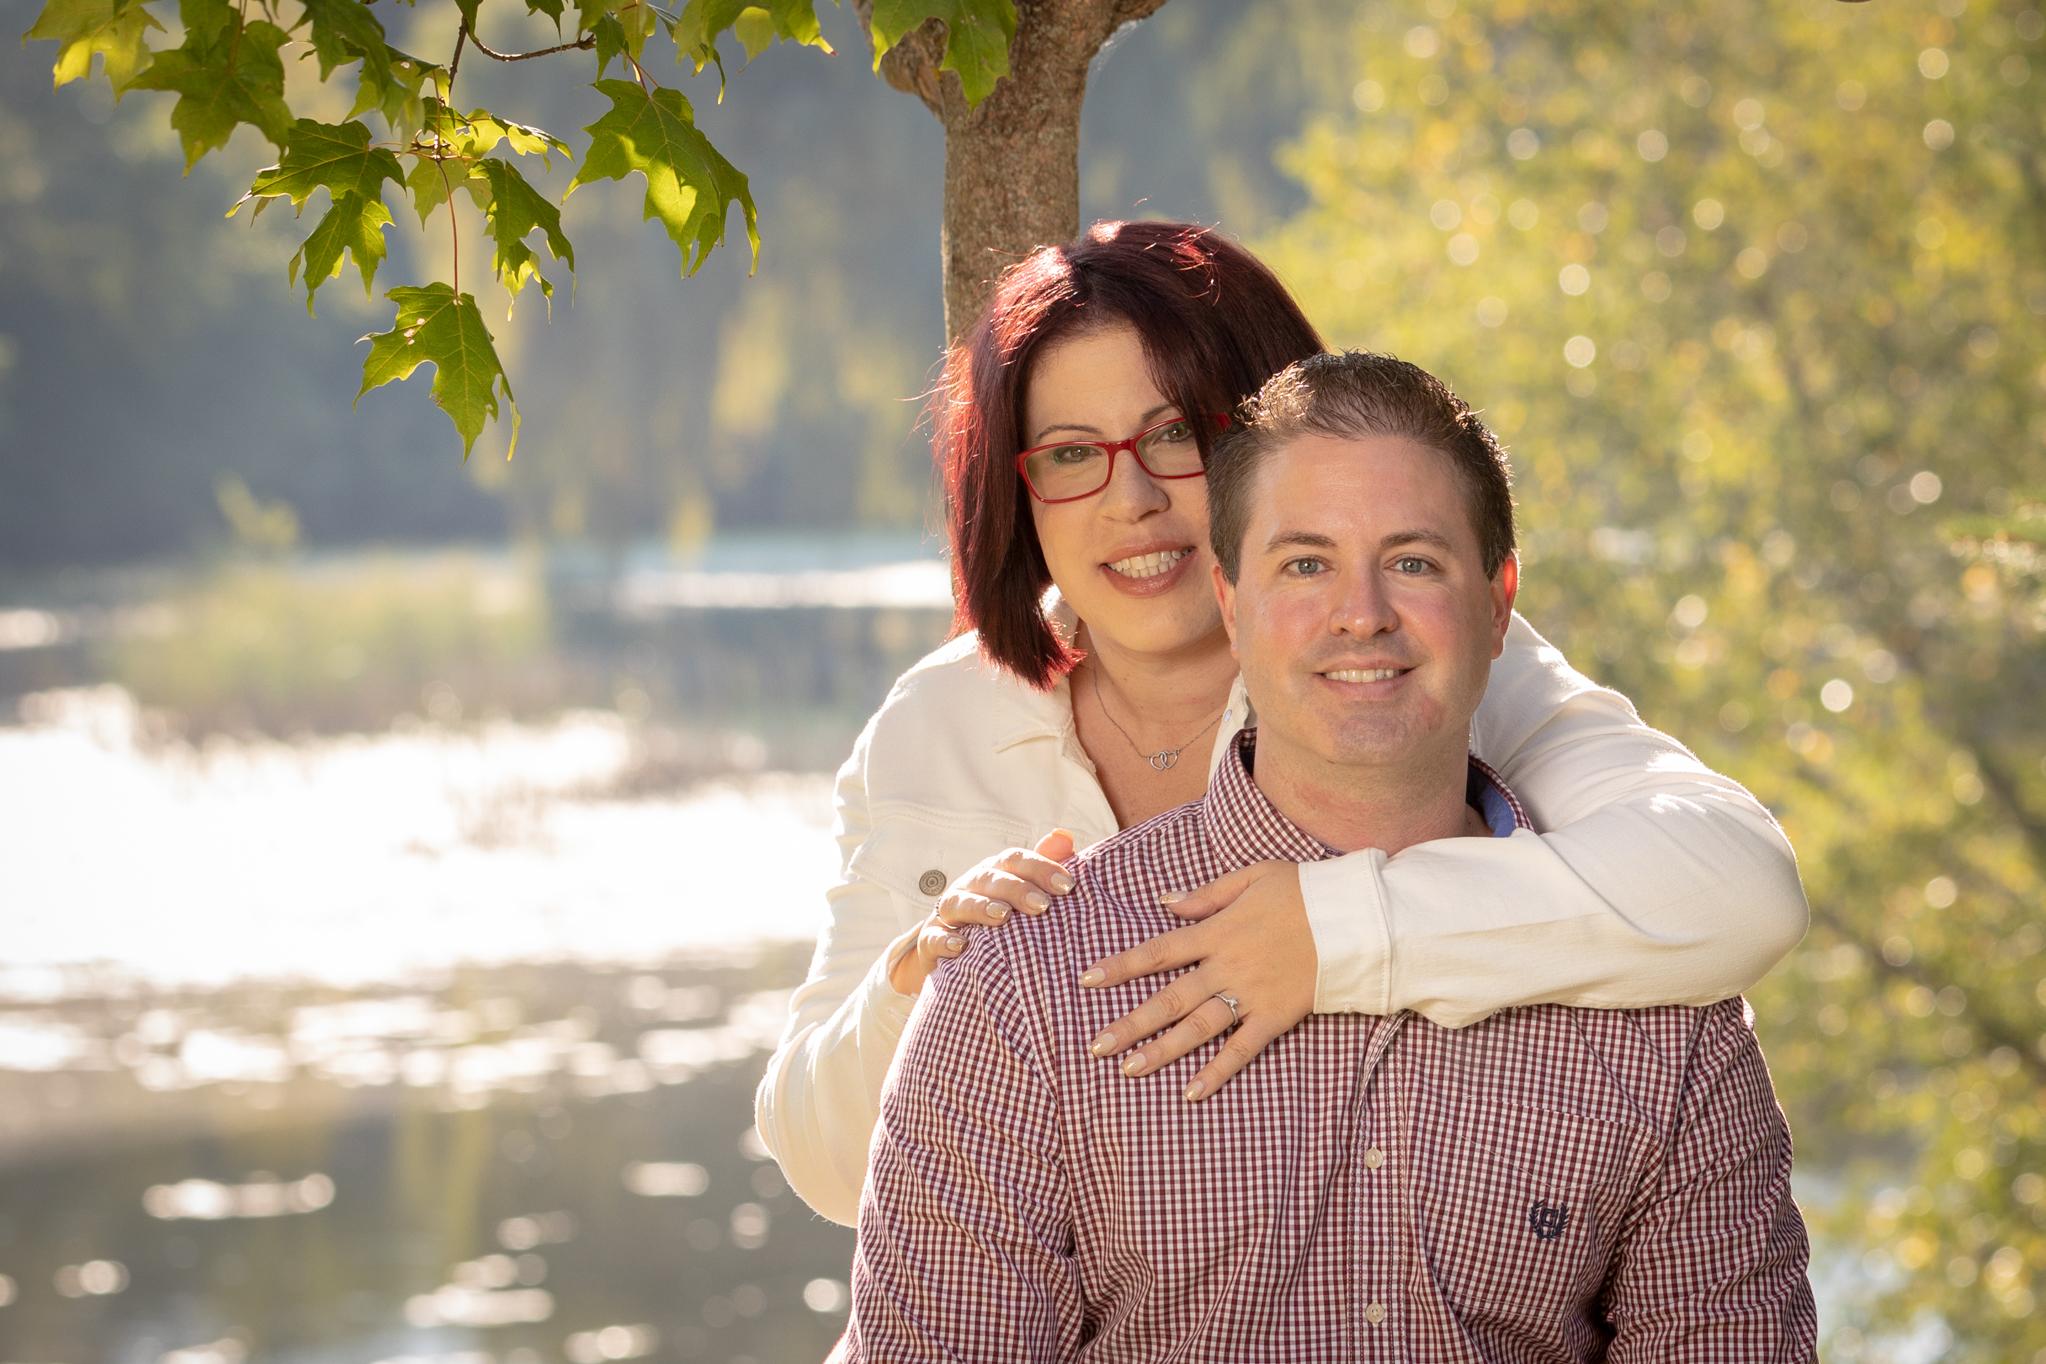 Abby_Ryan_engagement_wedding_algonquin-100.jpg